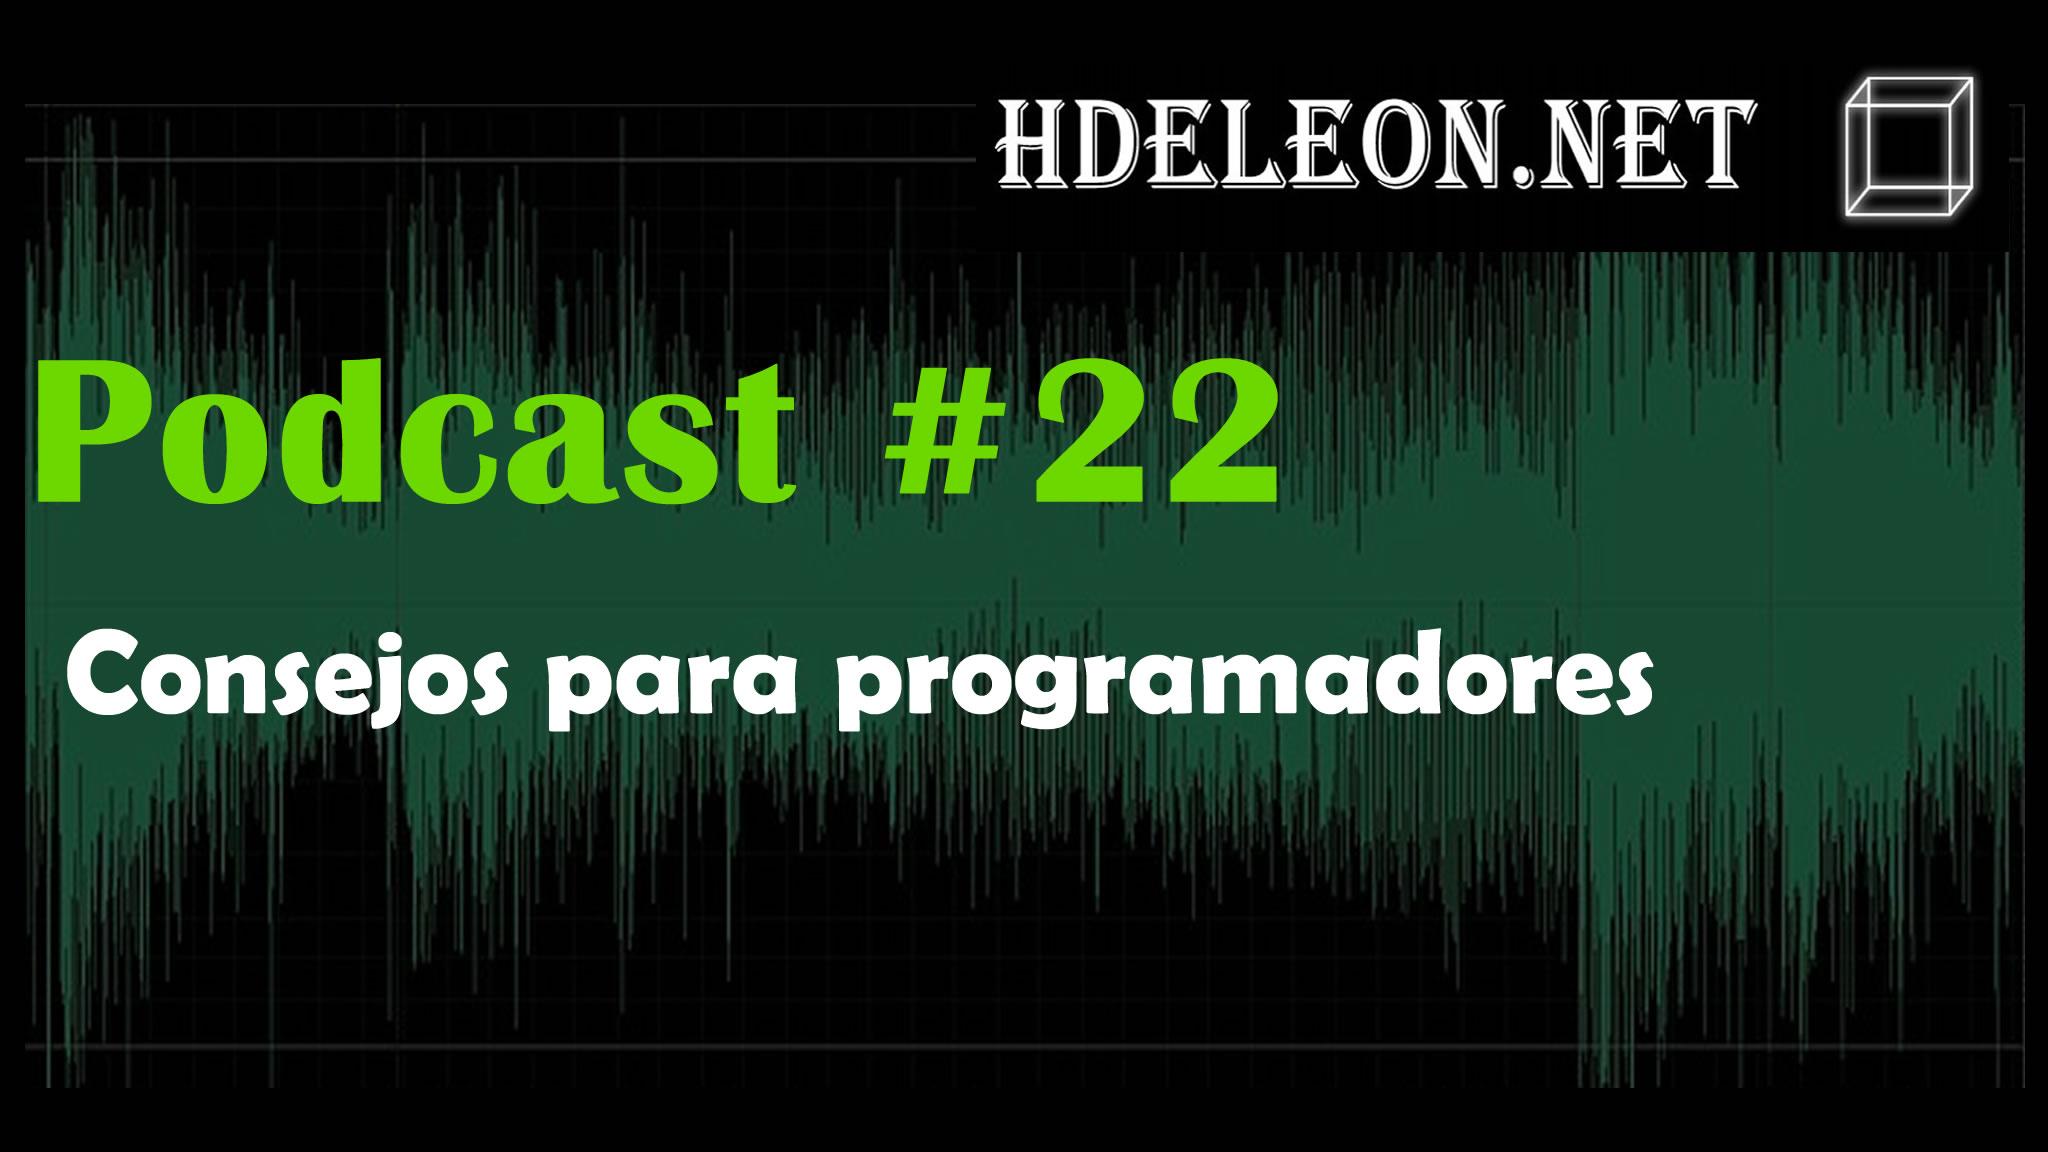 Podcast #22 – Consejos para programadores